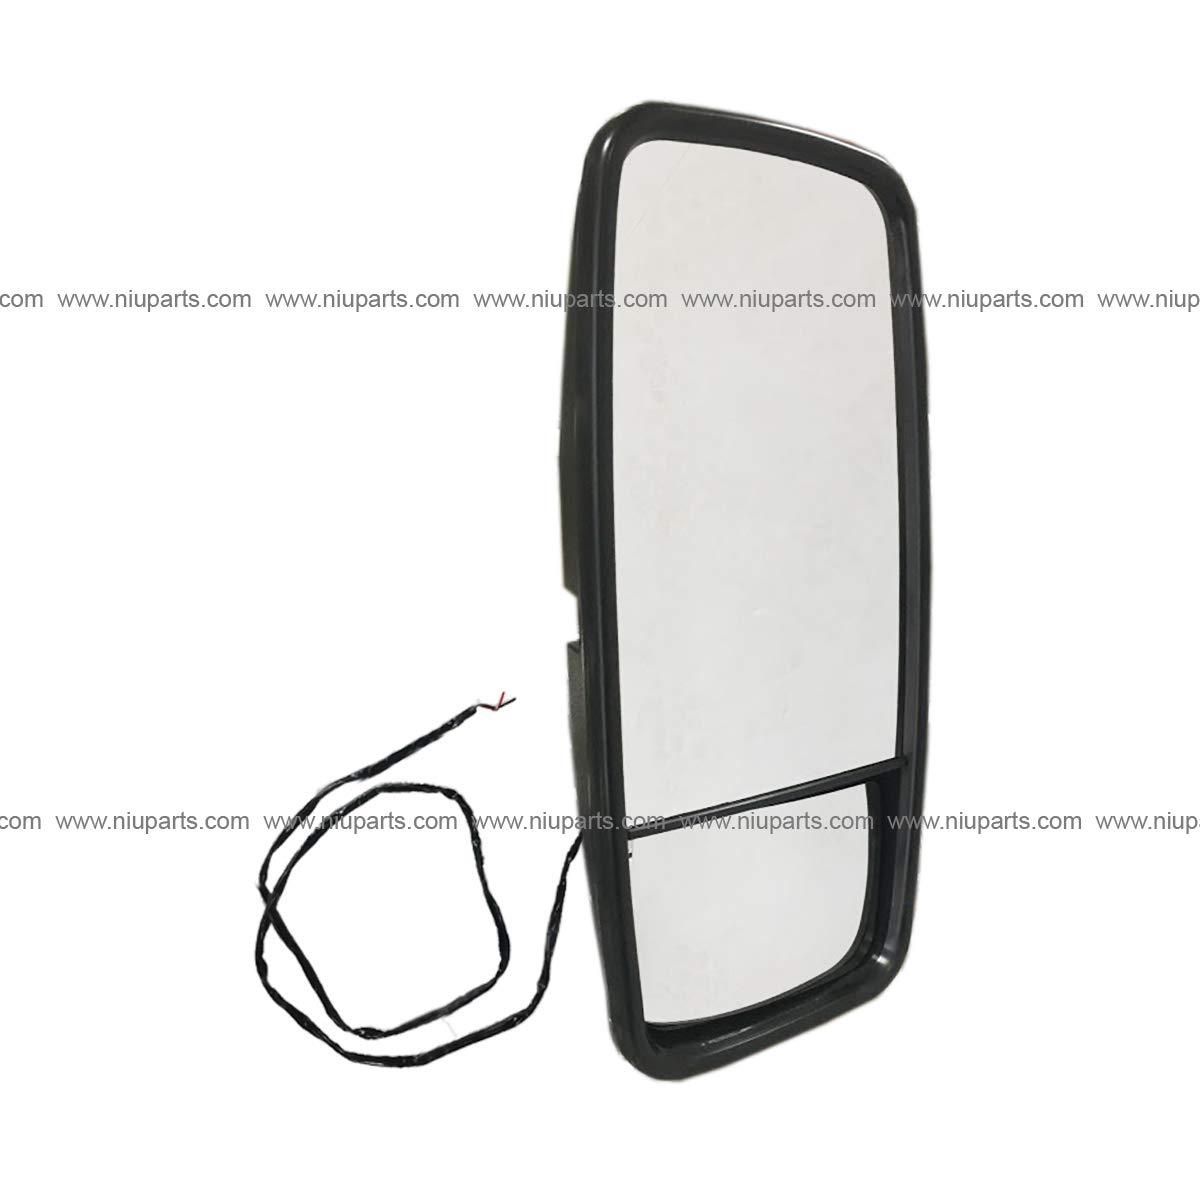 Door Mirror Main /& Convex Combination Style Heated Black Fit: Mitsubishi Fuso FE, FH, FG, FG4x4 FK455. Isuzu NPR, NRR. Nissan UD. Chevrolet//GMC W5500 Passenger Side